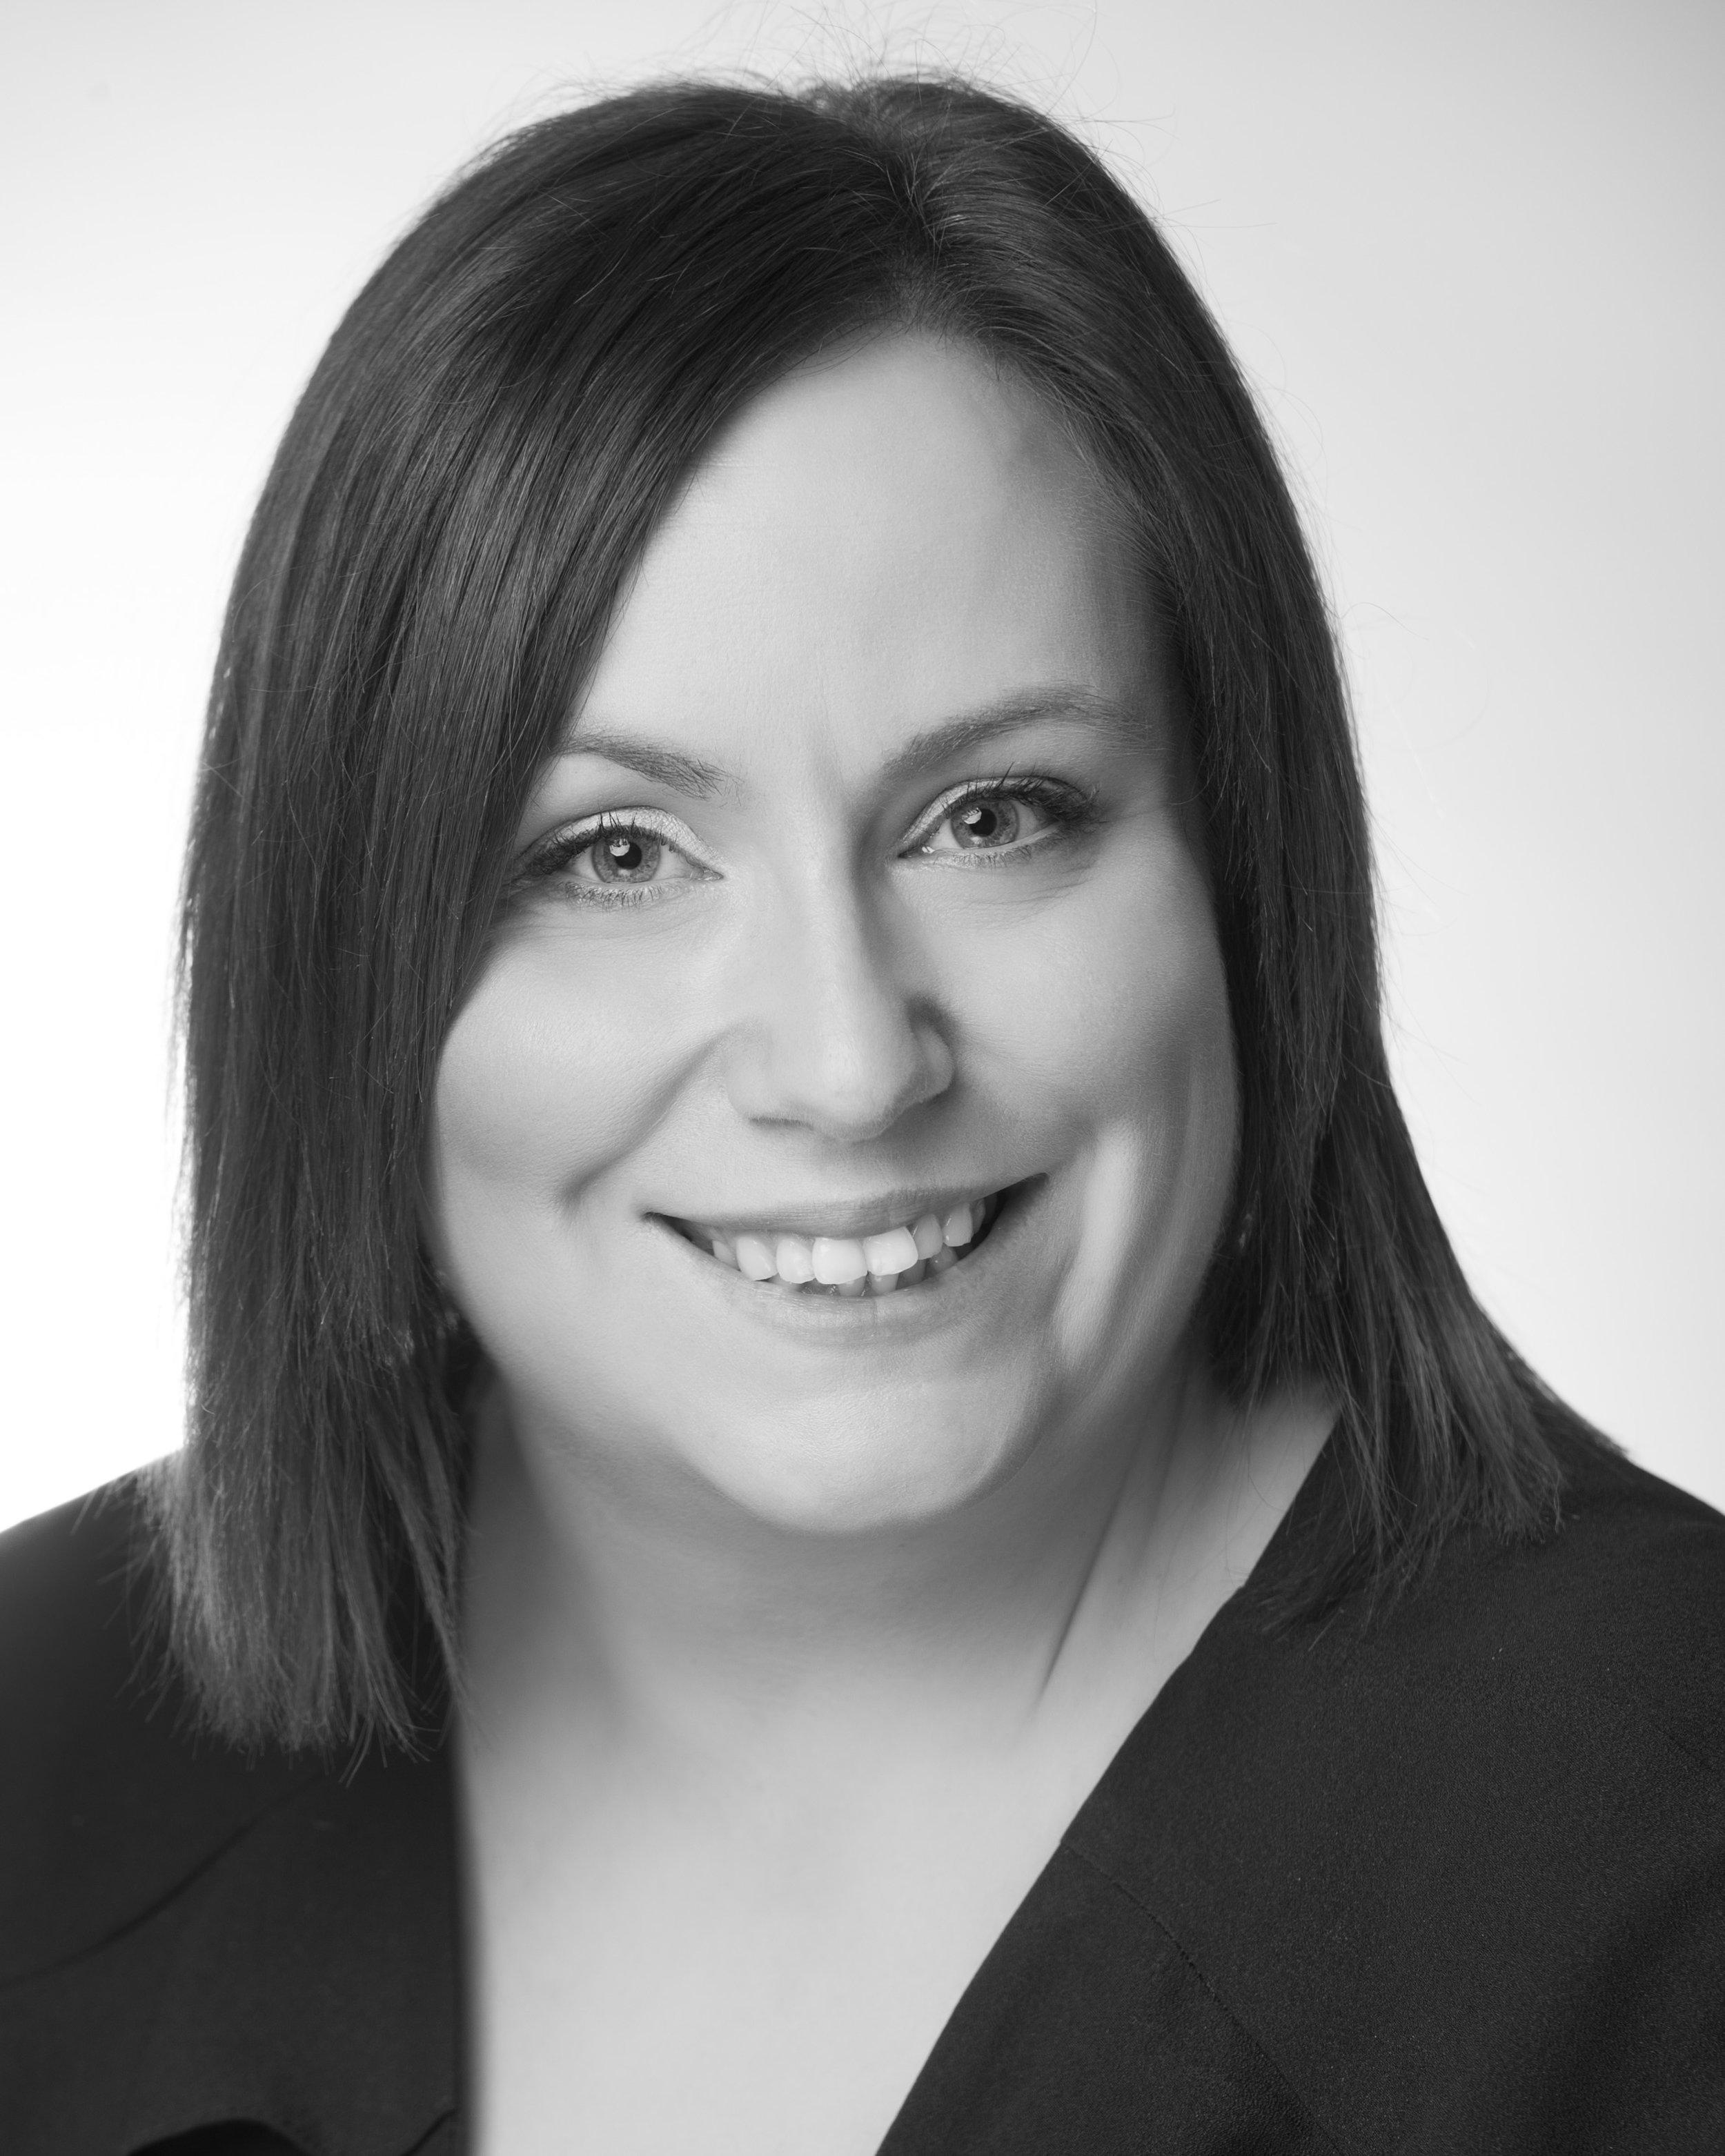 Laura Scarfe